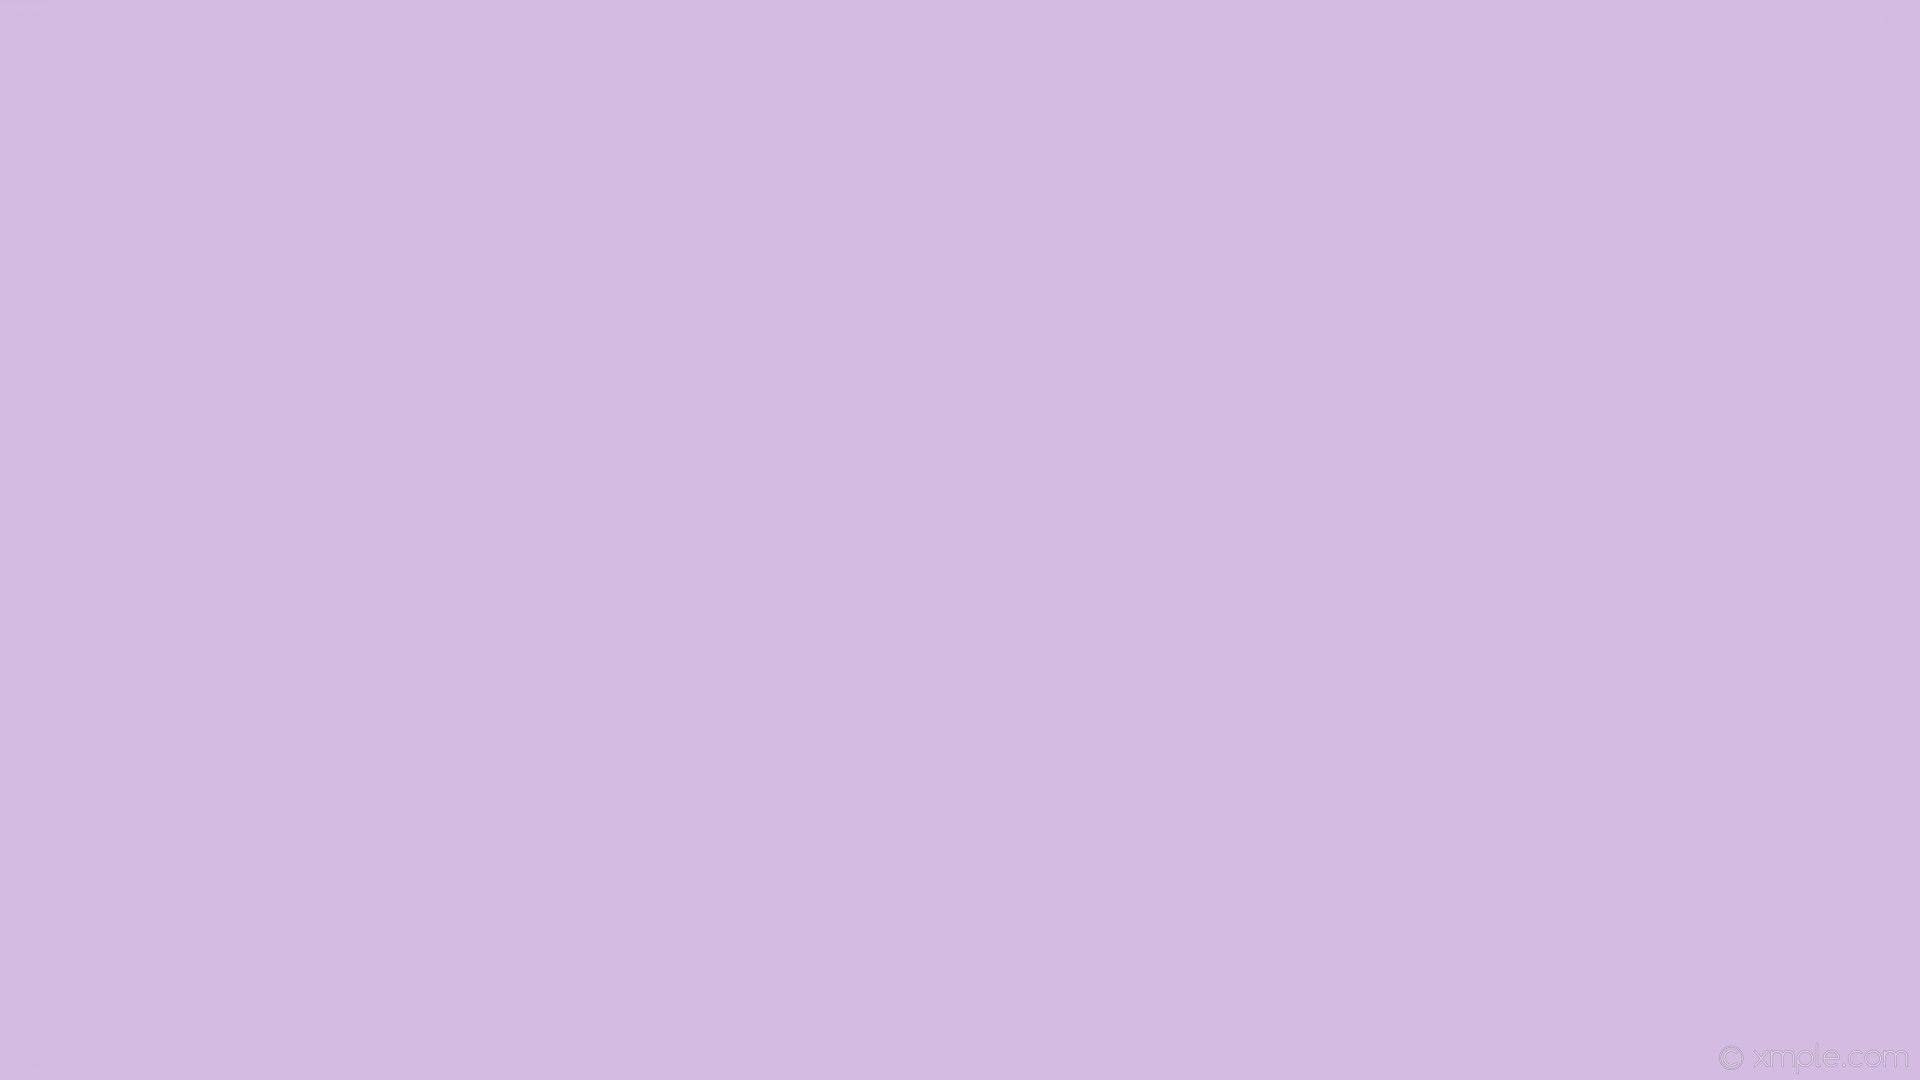 Aesthetic Light Purple Wallpapers - Wallpaper Cave